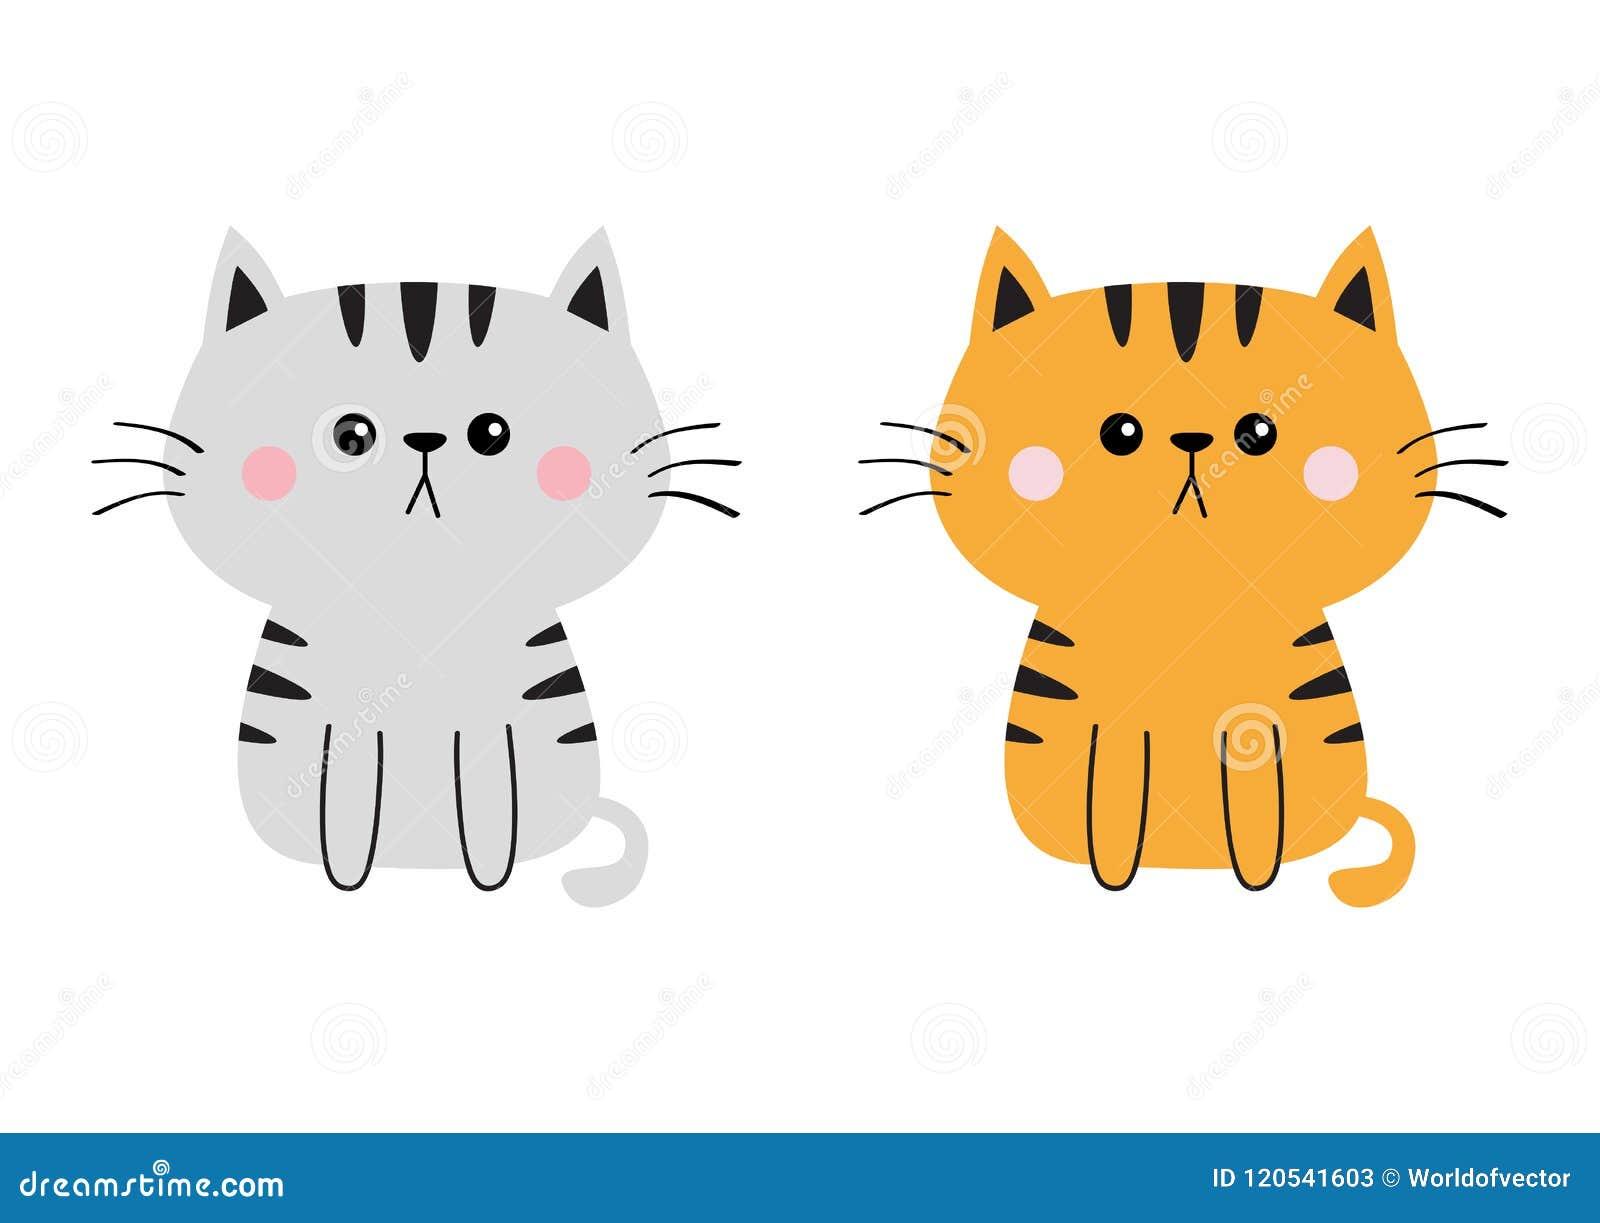 Image of: White Gray Orange Cat Sad Head Face Silhouette Set Cute Cartoon Sitting Kitty Character Kawaii Dreamstimecom Gray Orange Cat Sad Head Face Silhouette Set Cute Cartoon Sitting